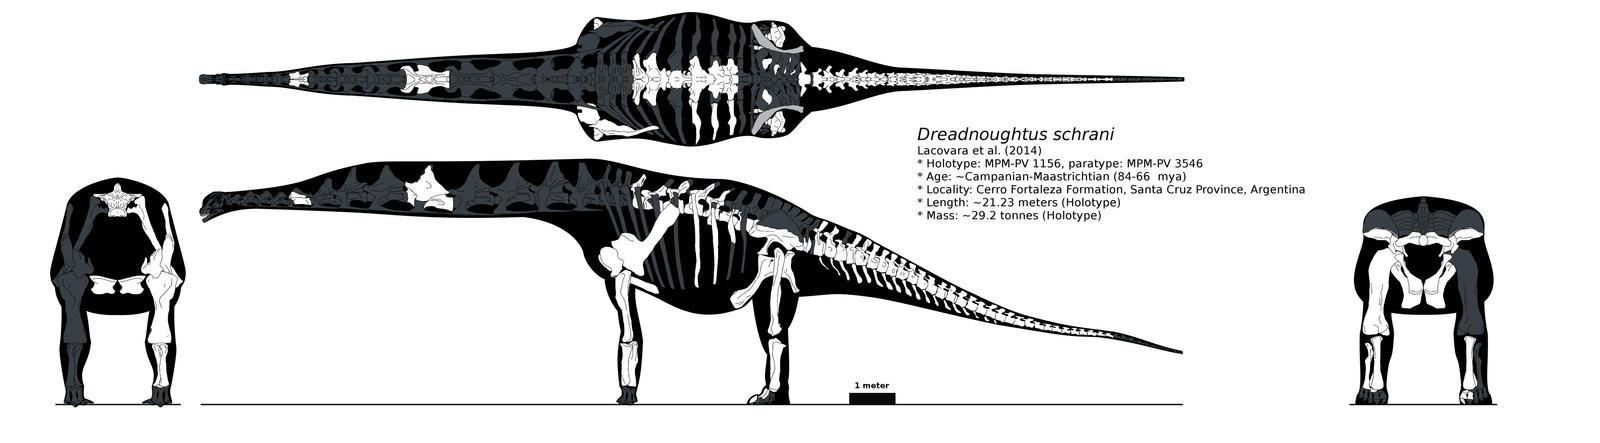 Dreadnoughtus  multiview skeletal